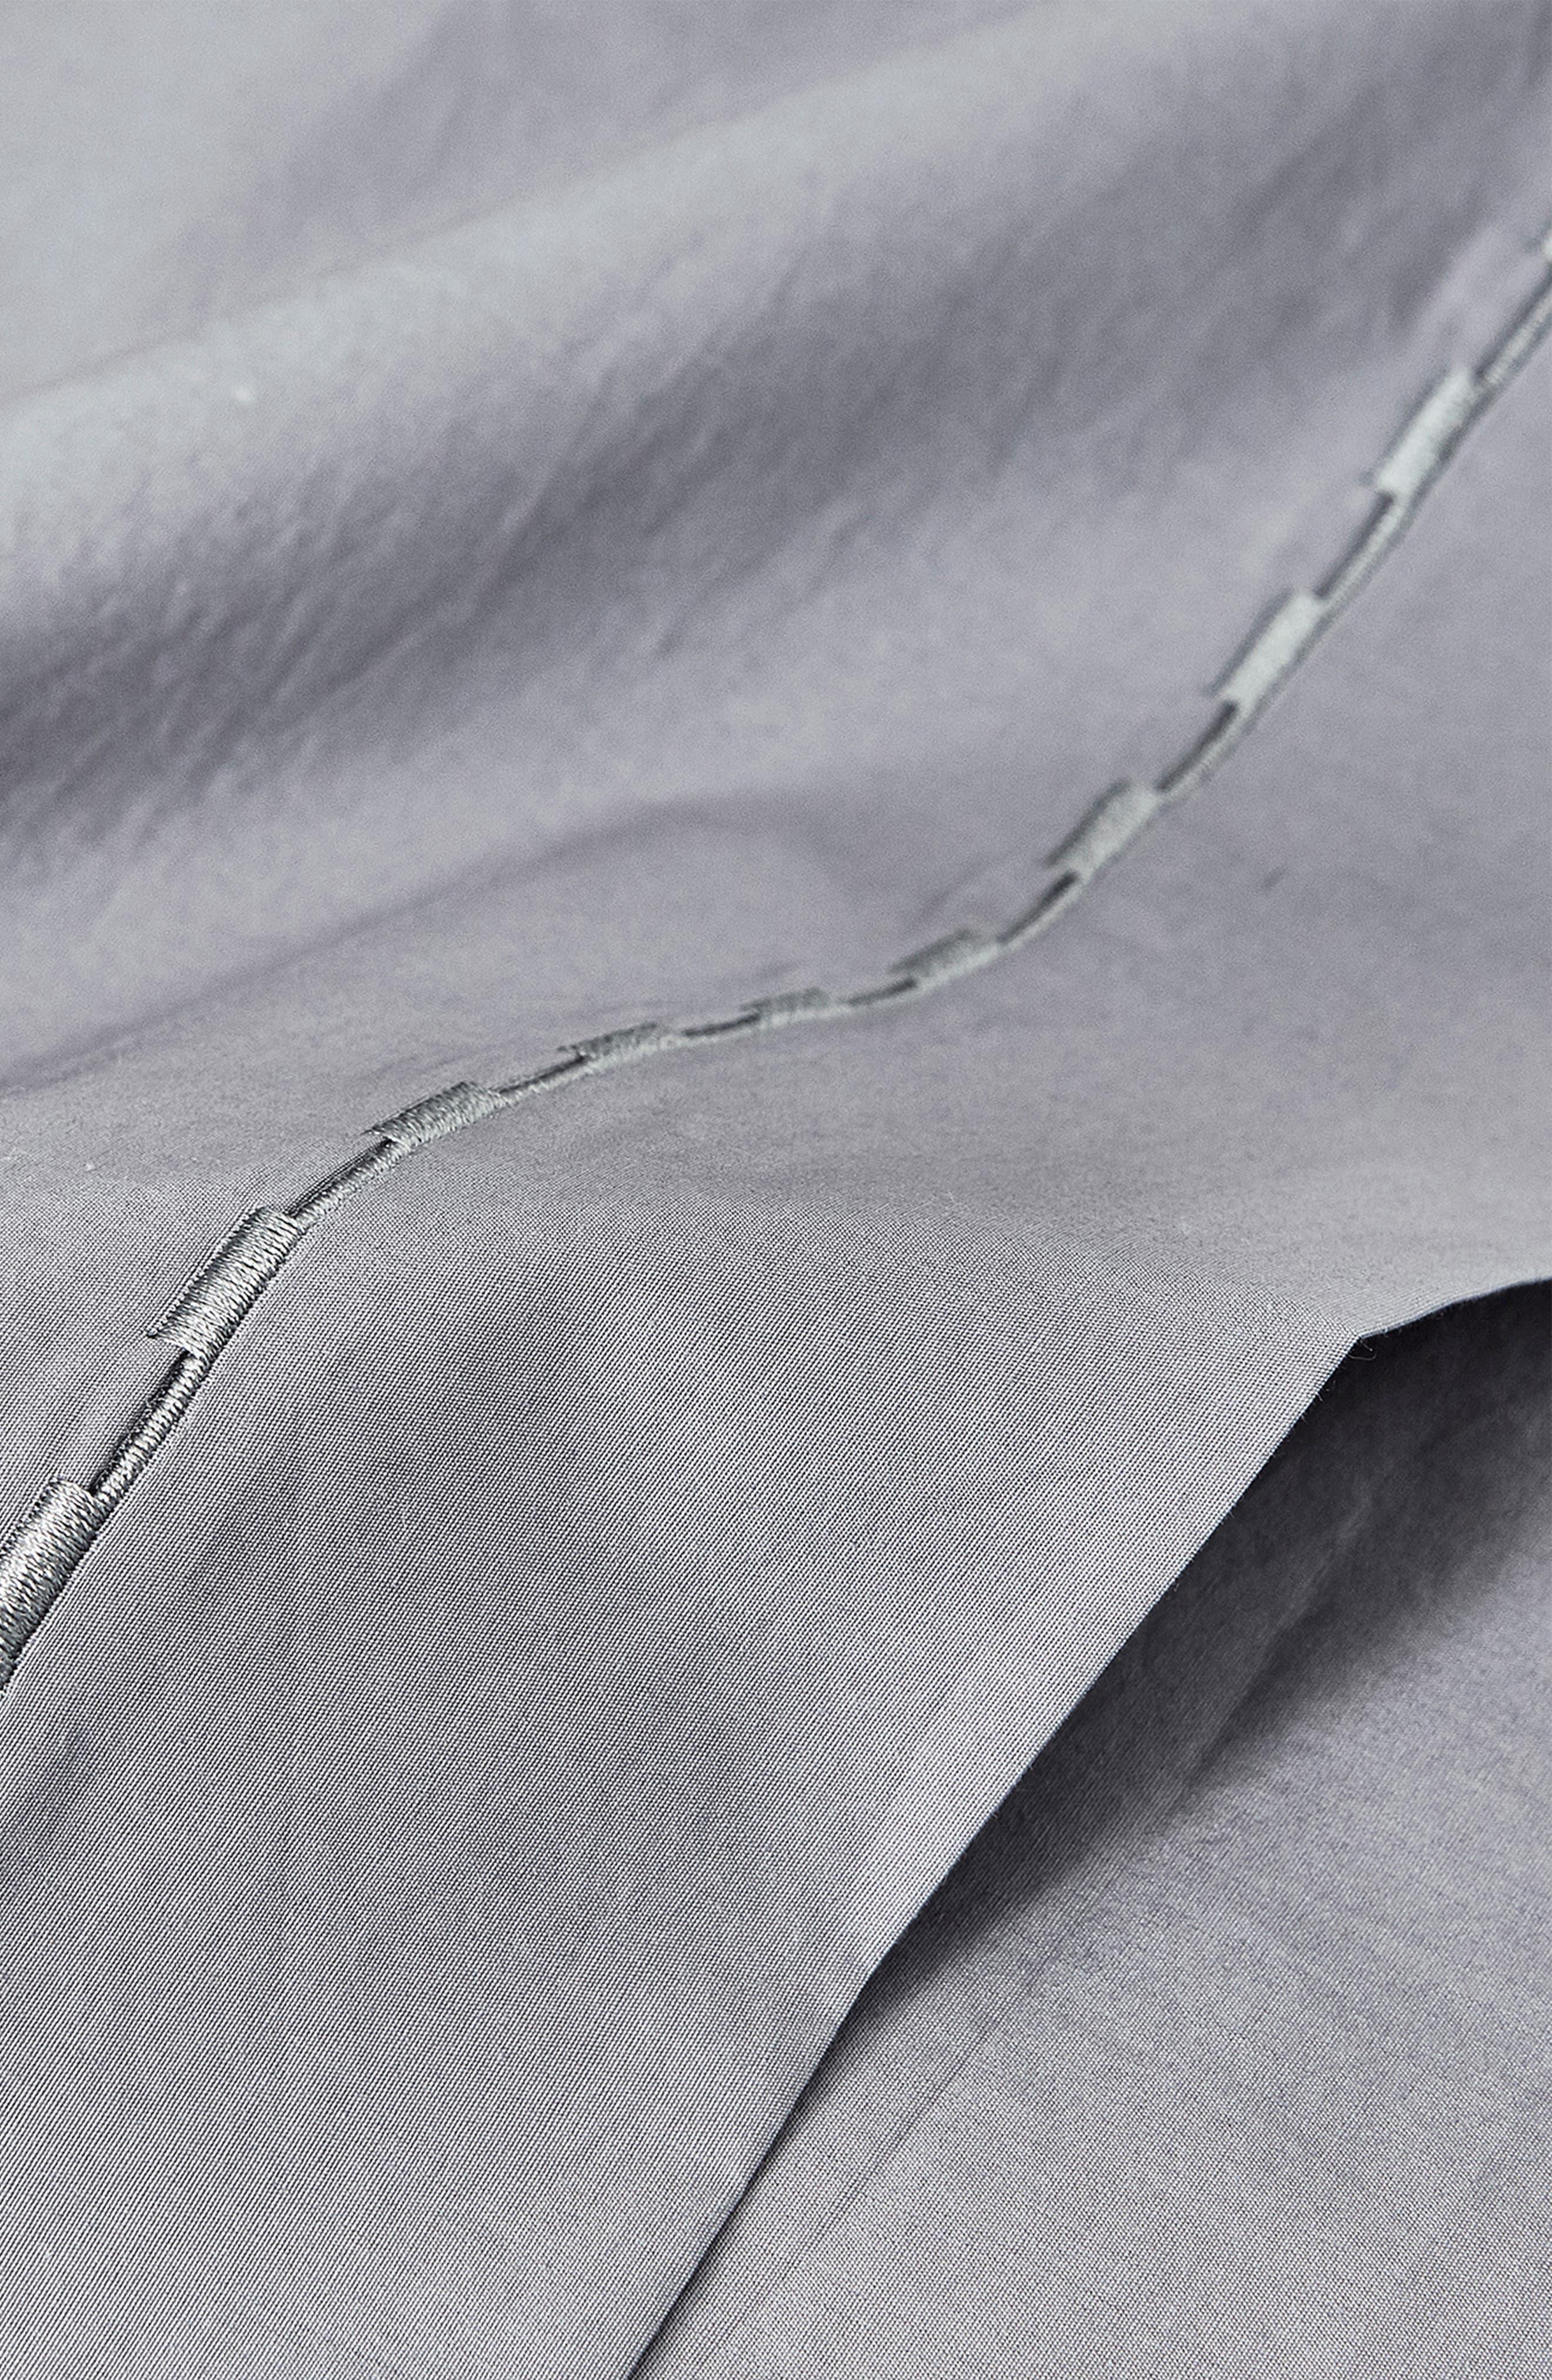 Cotton Percale Sheet Set,                             Alternate thumbnail 2, color,                             GREY-BLUE